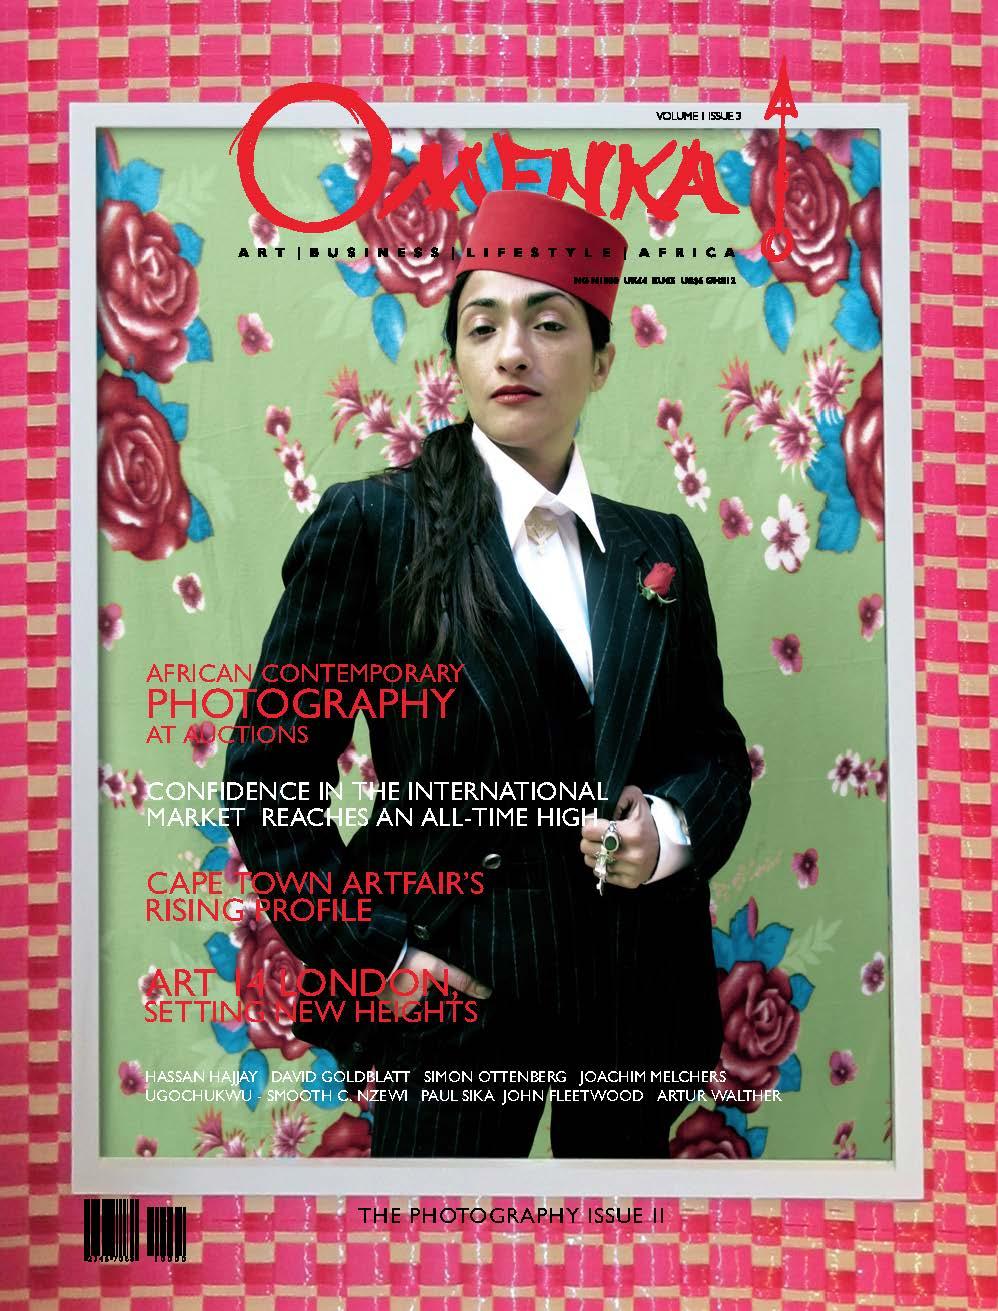 Omenka Issue1Vol3_2013 1_Page_1.jpg